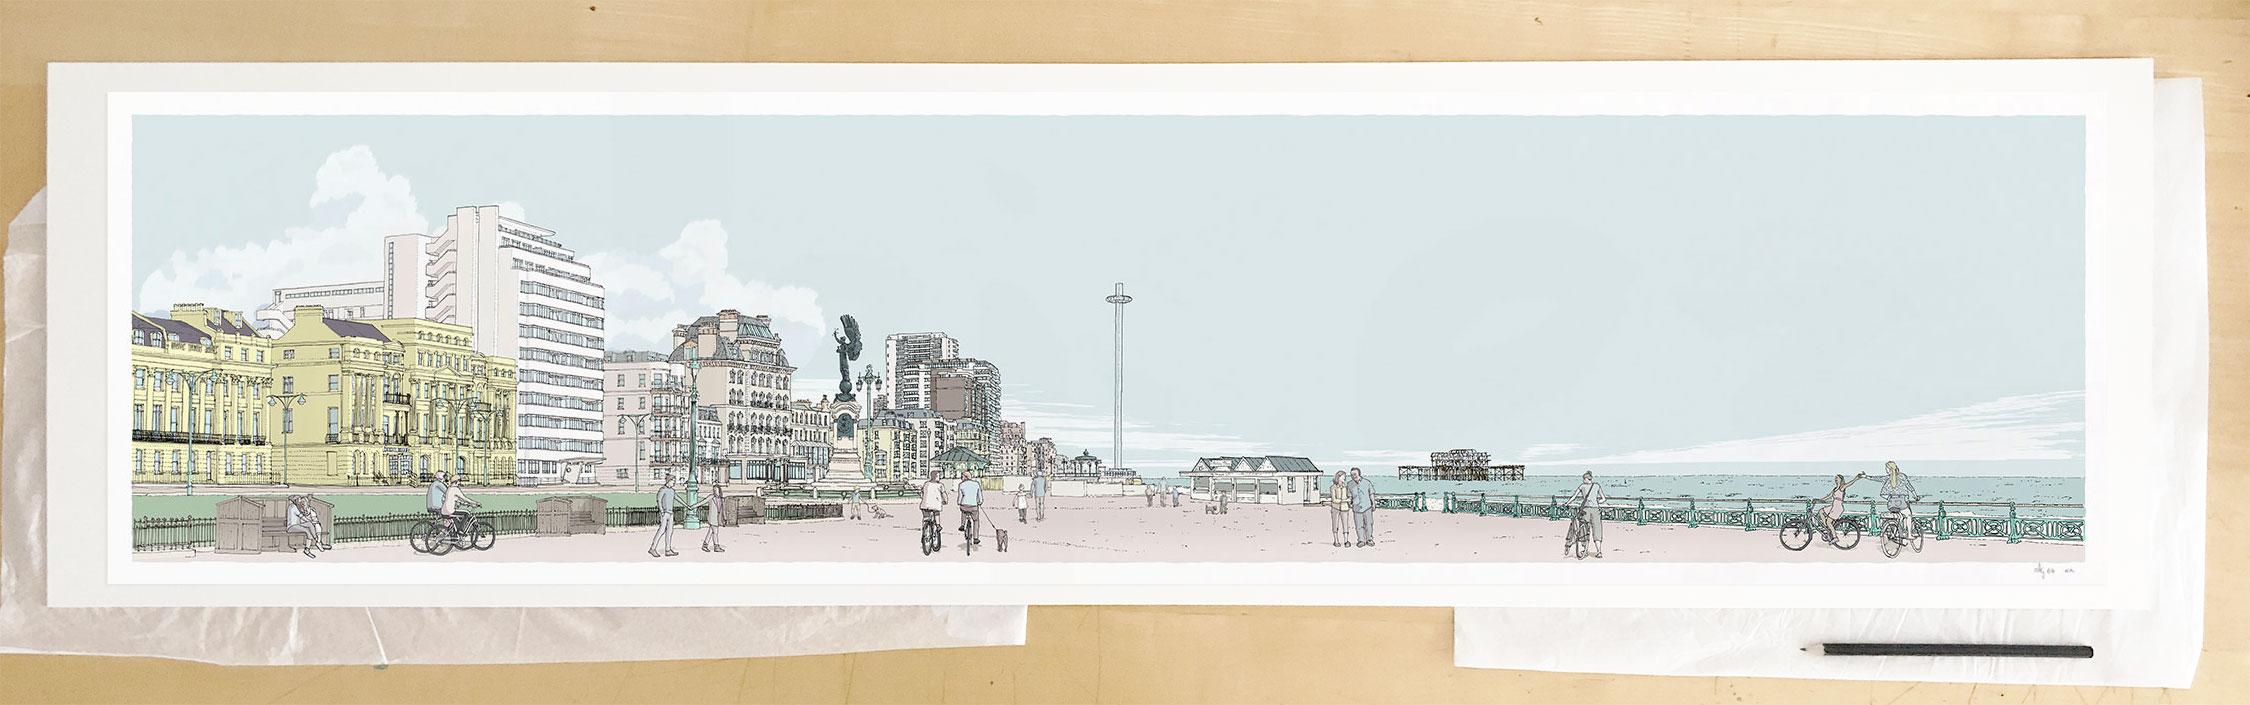 Fine art print by UK artist alej ez titled Morning Walk Sea Promenade Brighton and Hove Pebble Beach